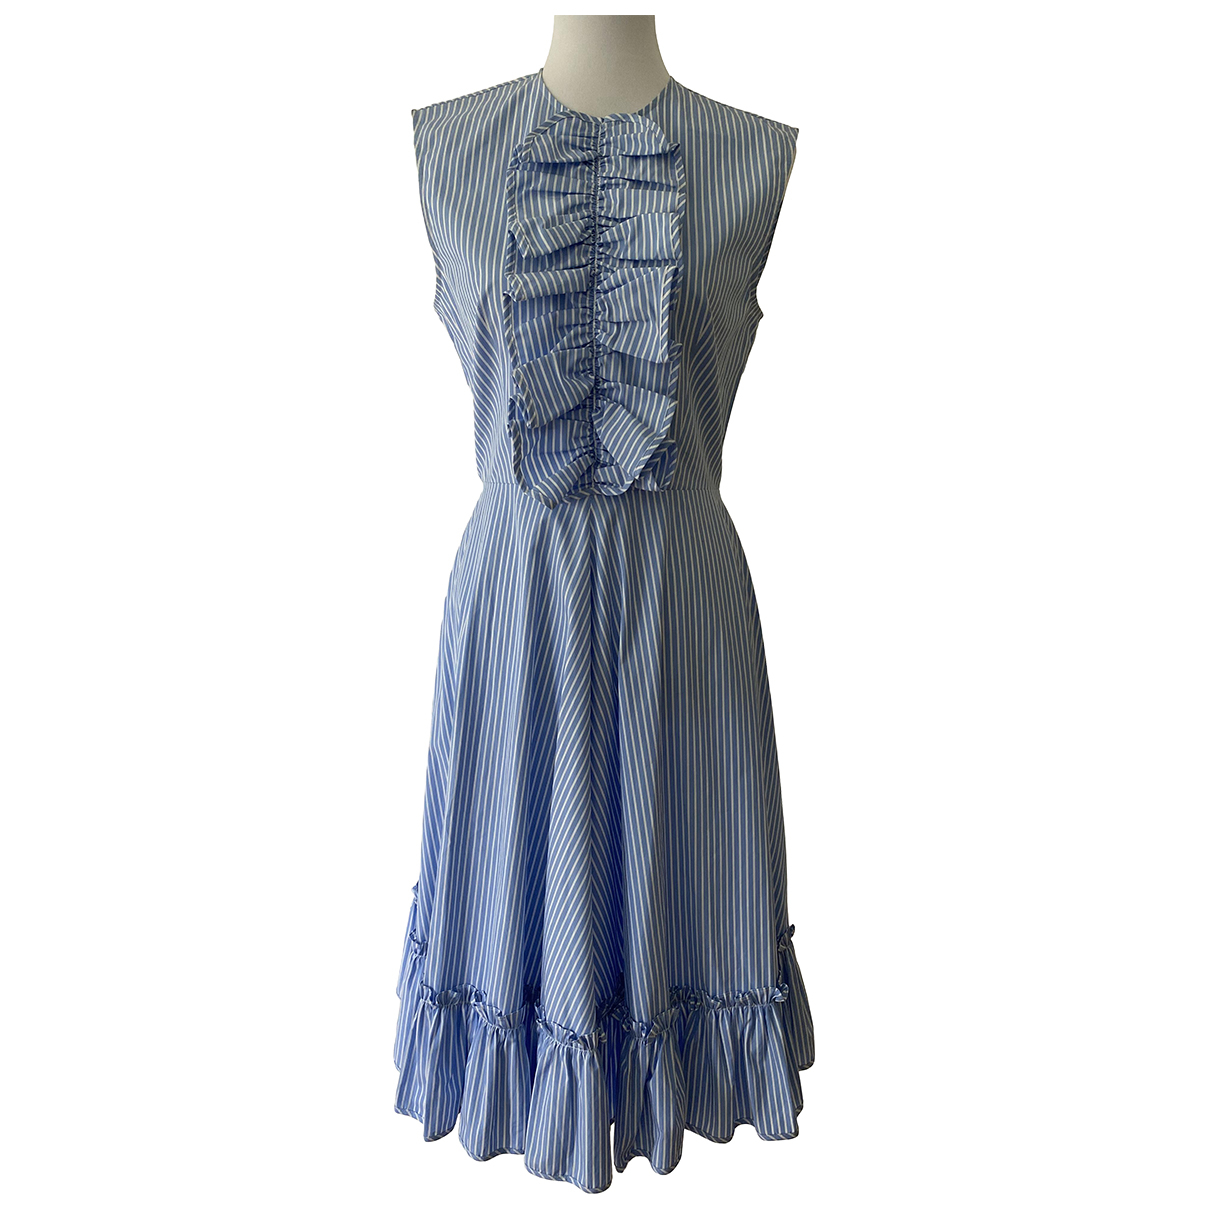 J.w. Anderson \N Blue Cotton dress for Women 8 US